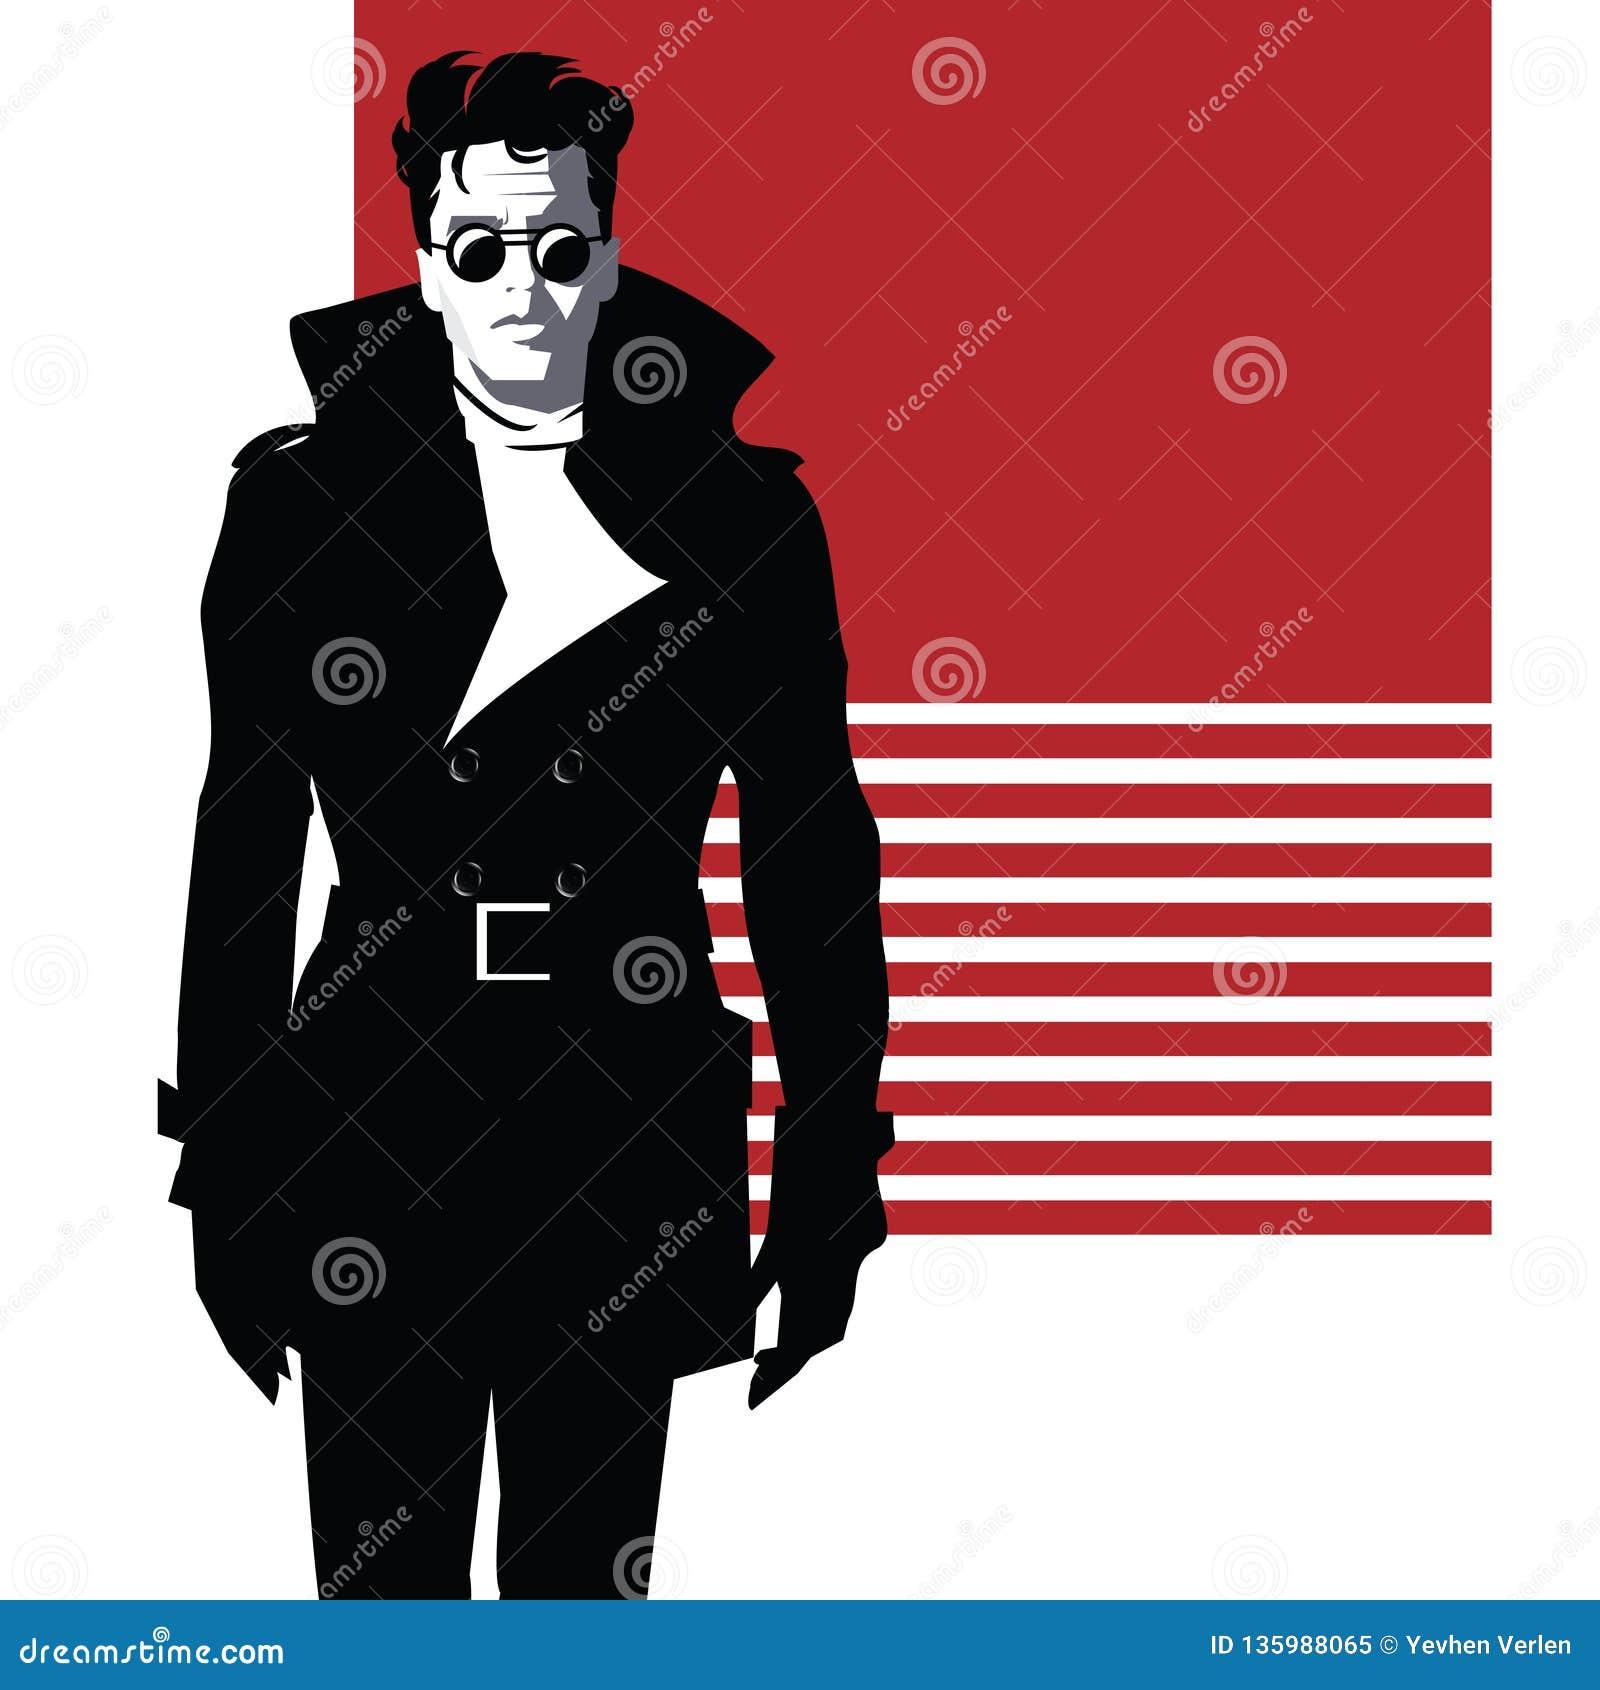 Fashion man in style pop art. Vector illustration